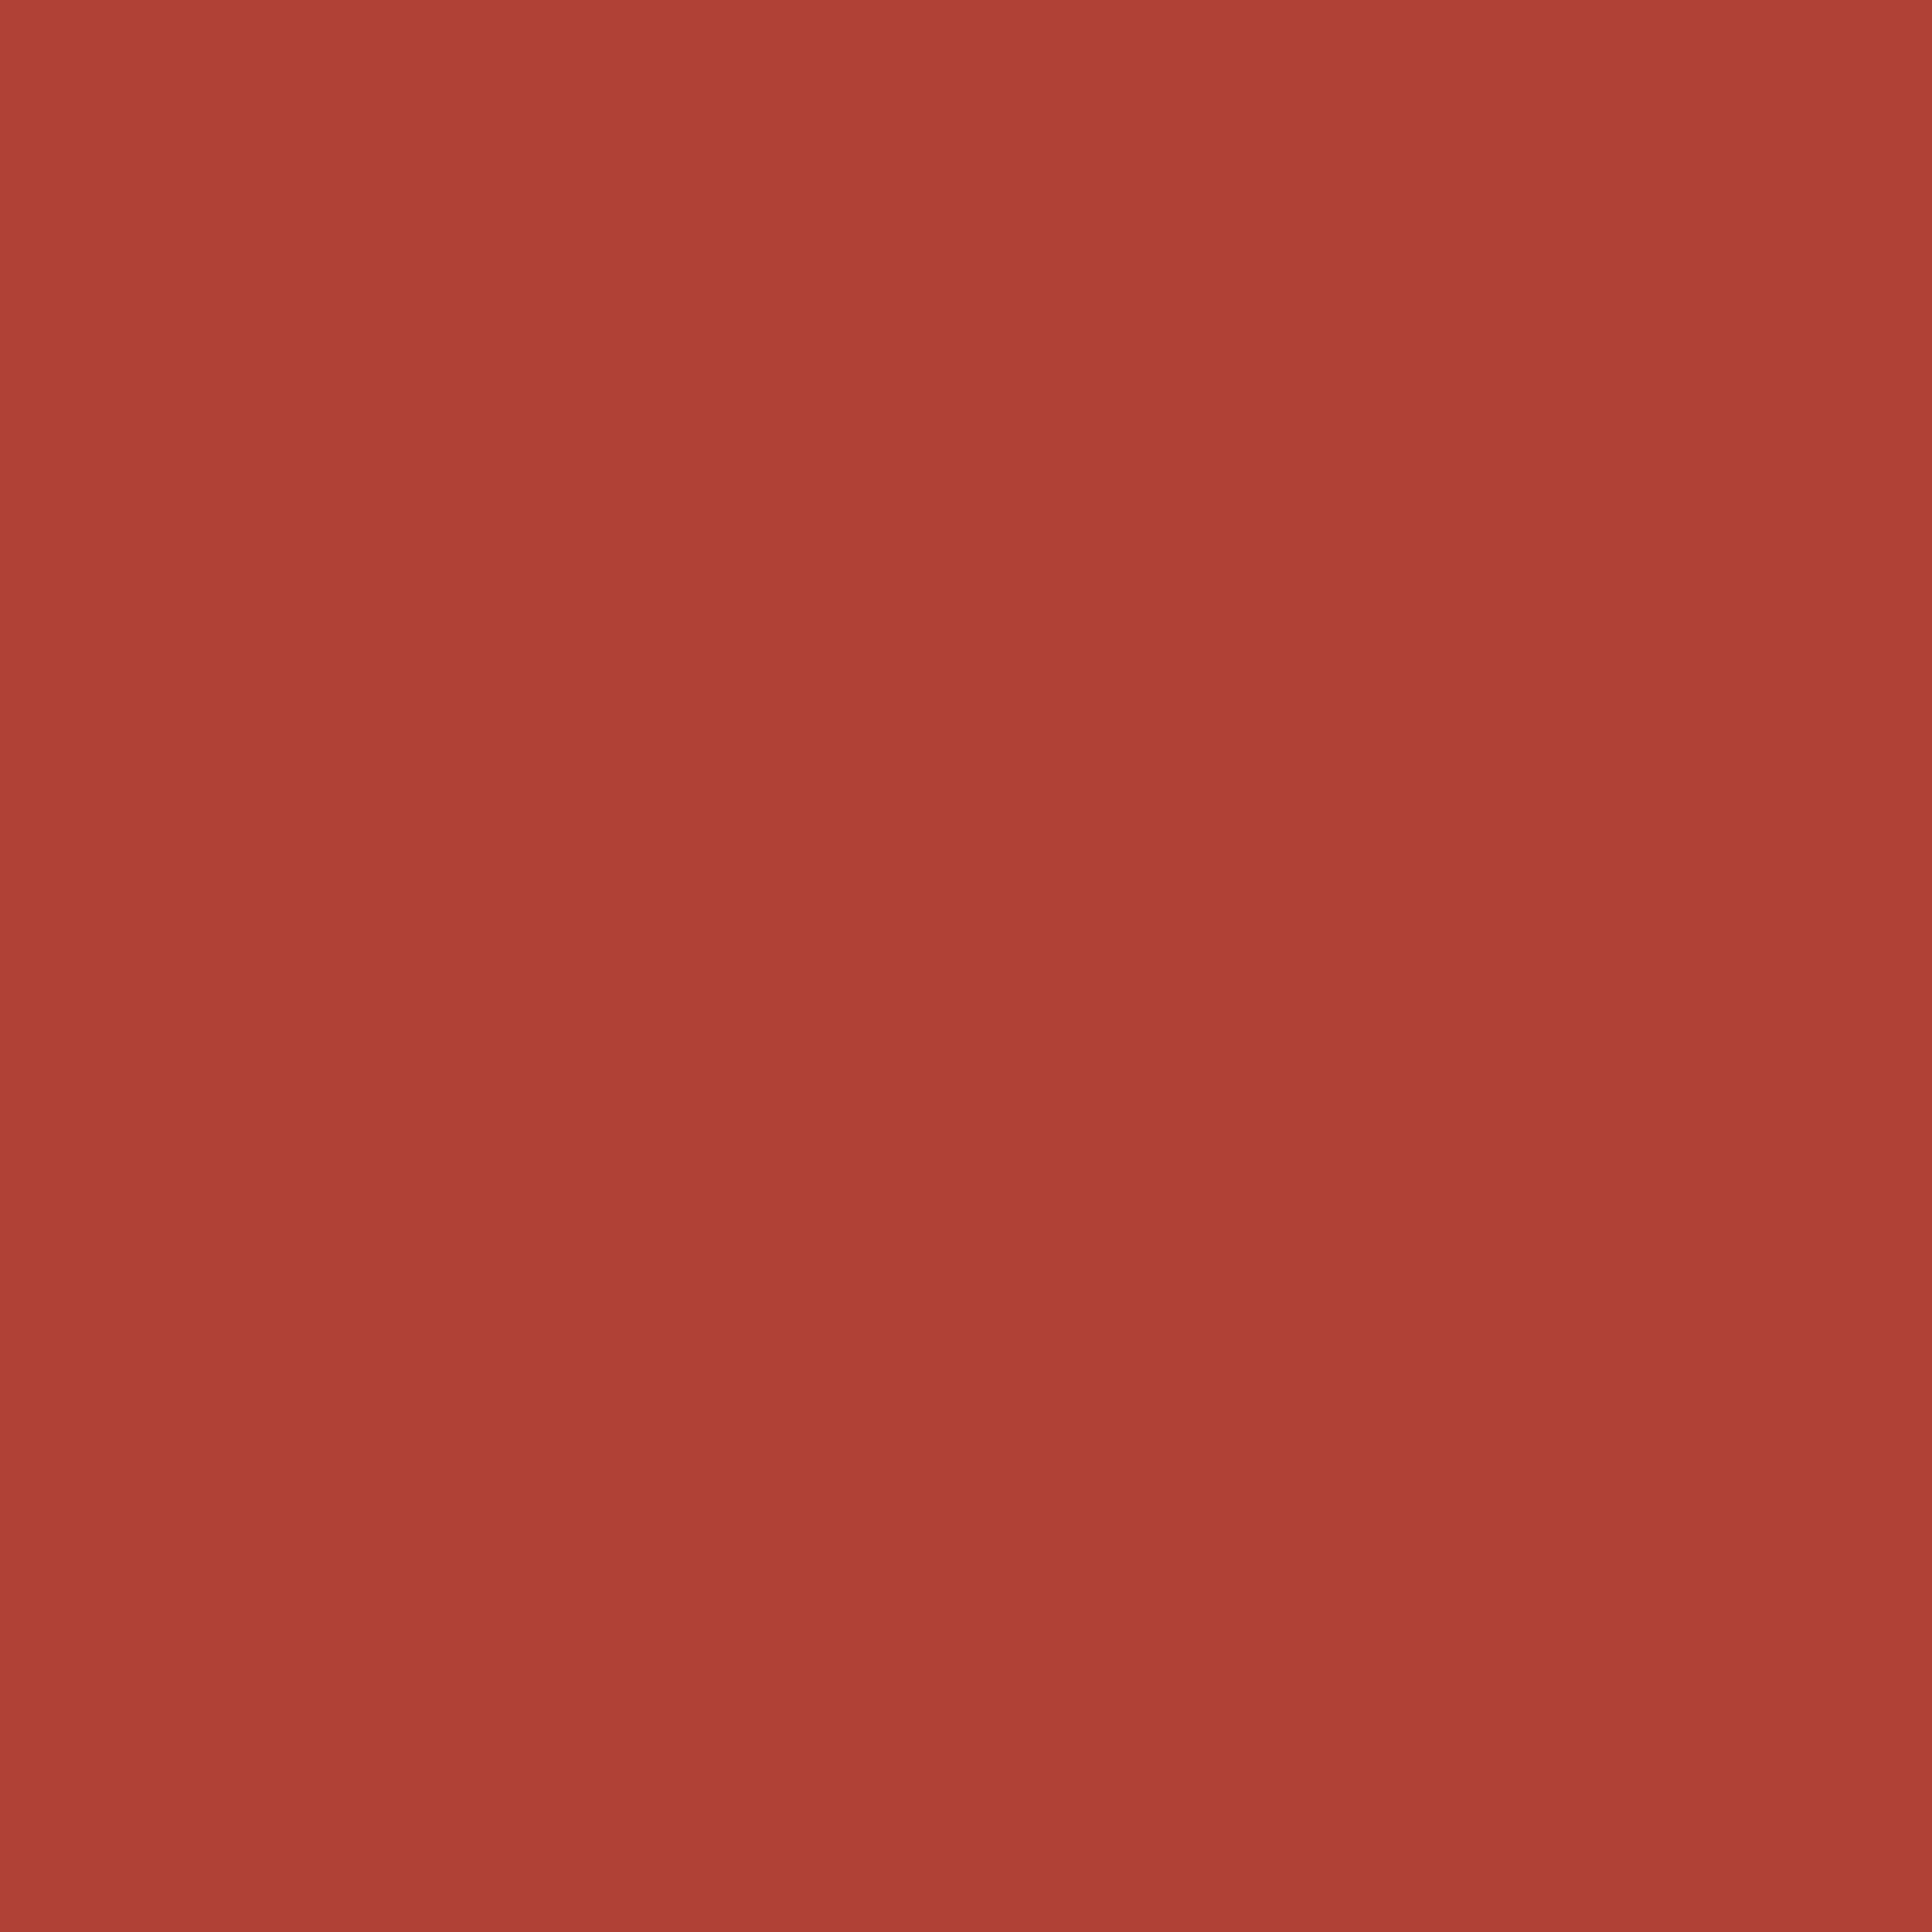 2048x2048 Pale Carmine Solid Color Background